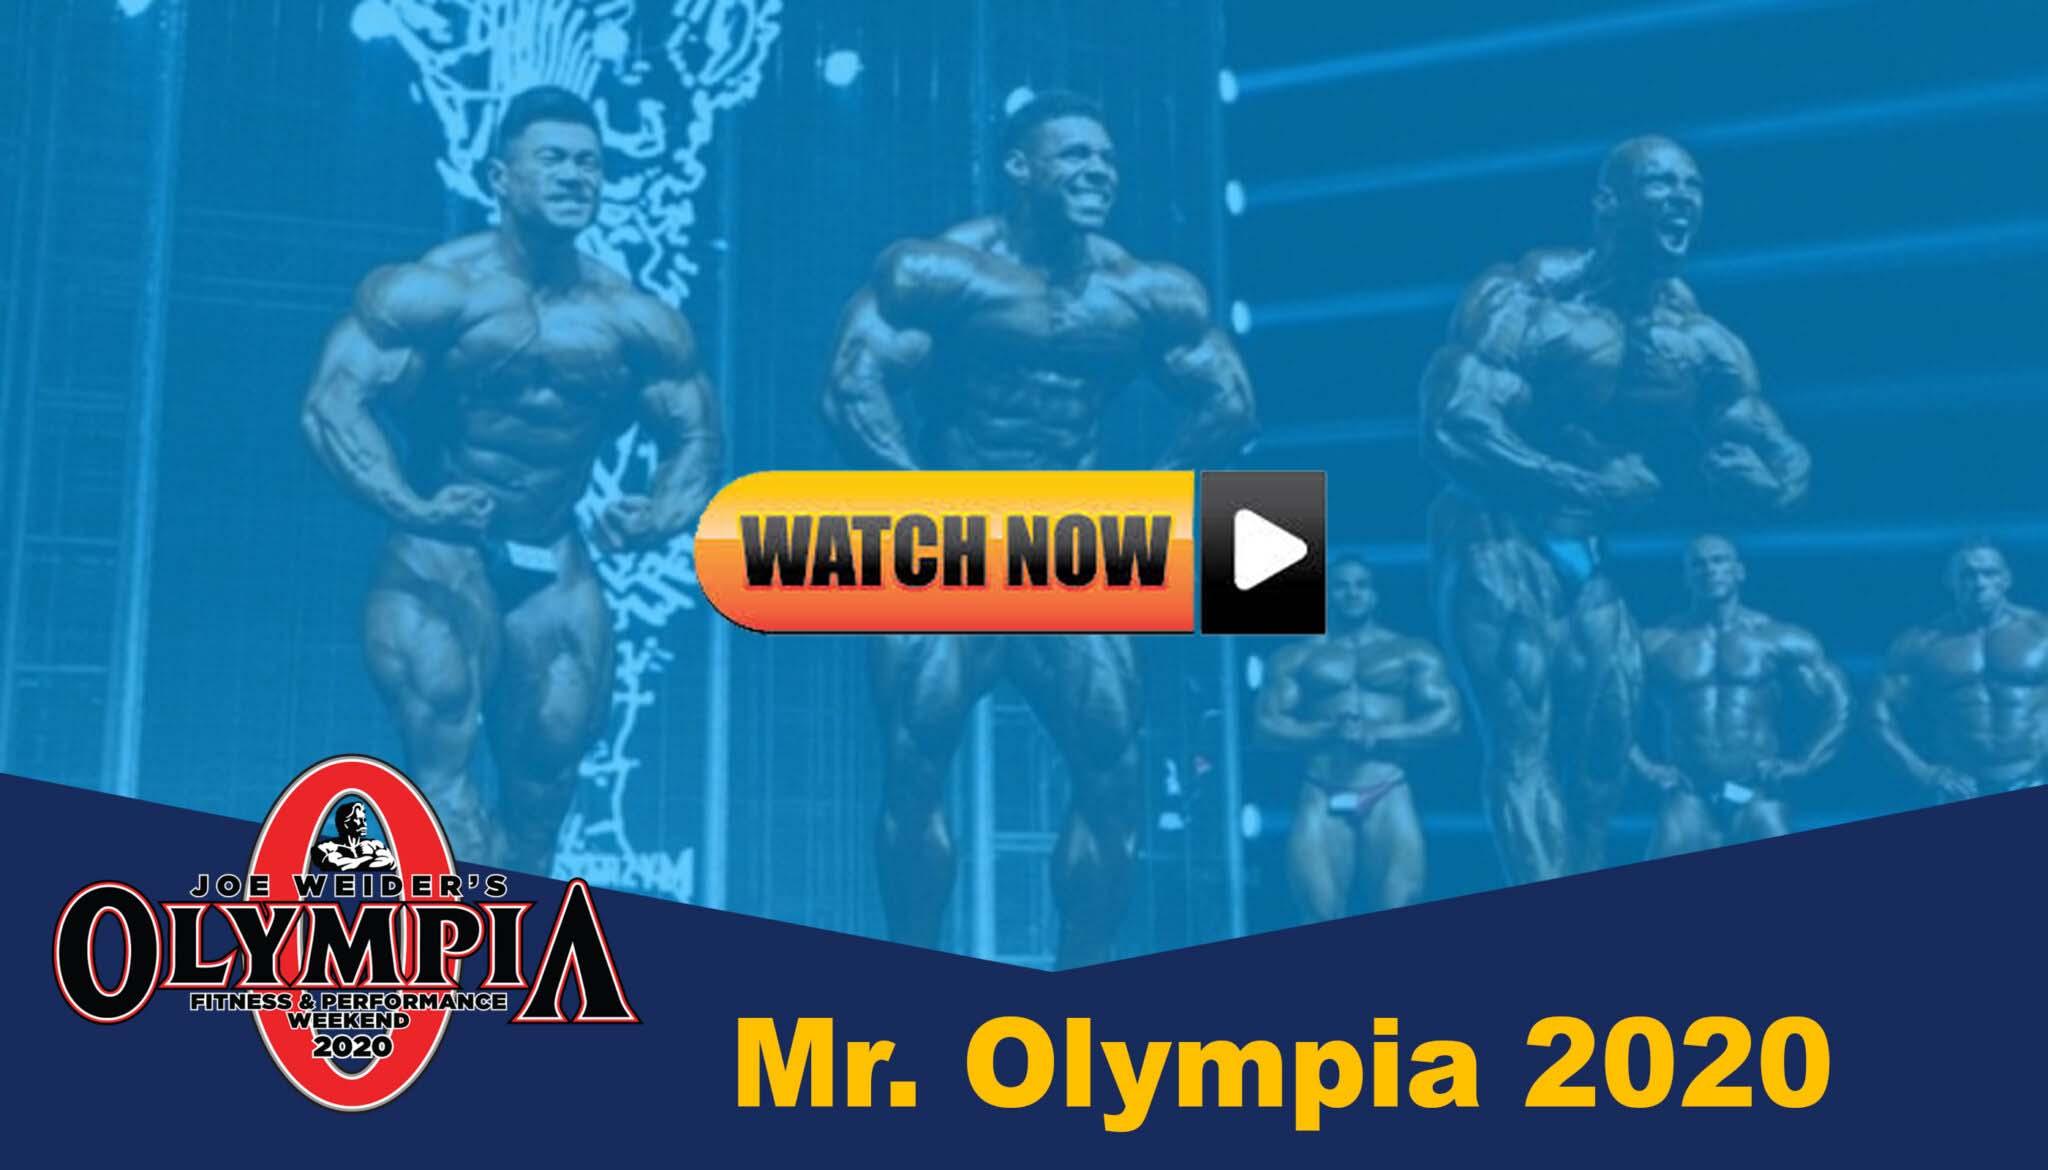 Crackstreams Joe Weider's Mr. Olympia Live Stream Reddit 2020 Online, Dates, Schedule, Prize Money, Top Bodybuilders and Predictions